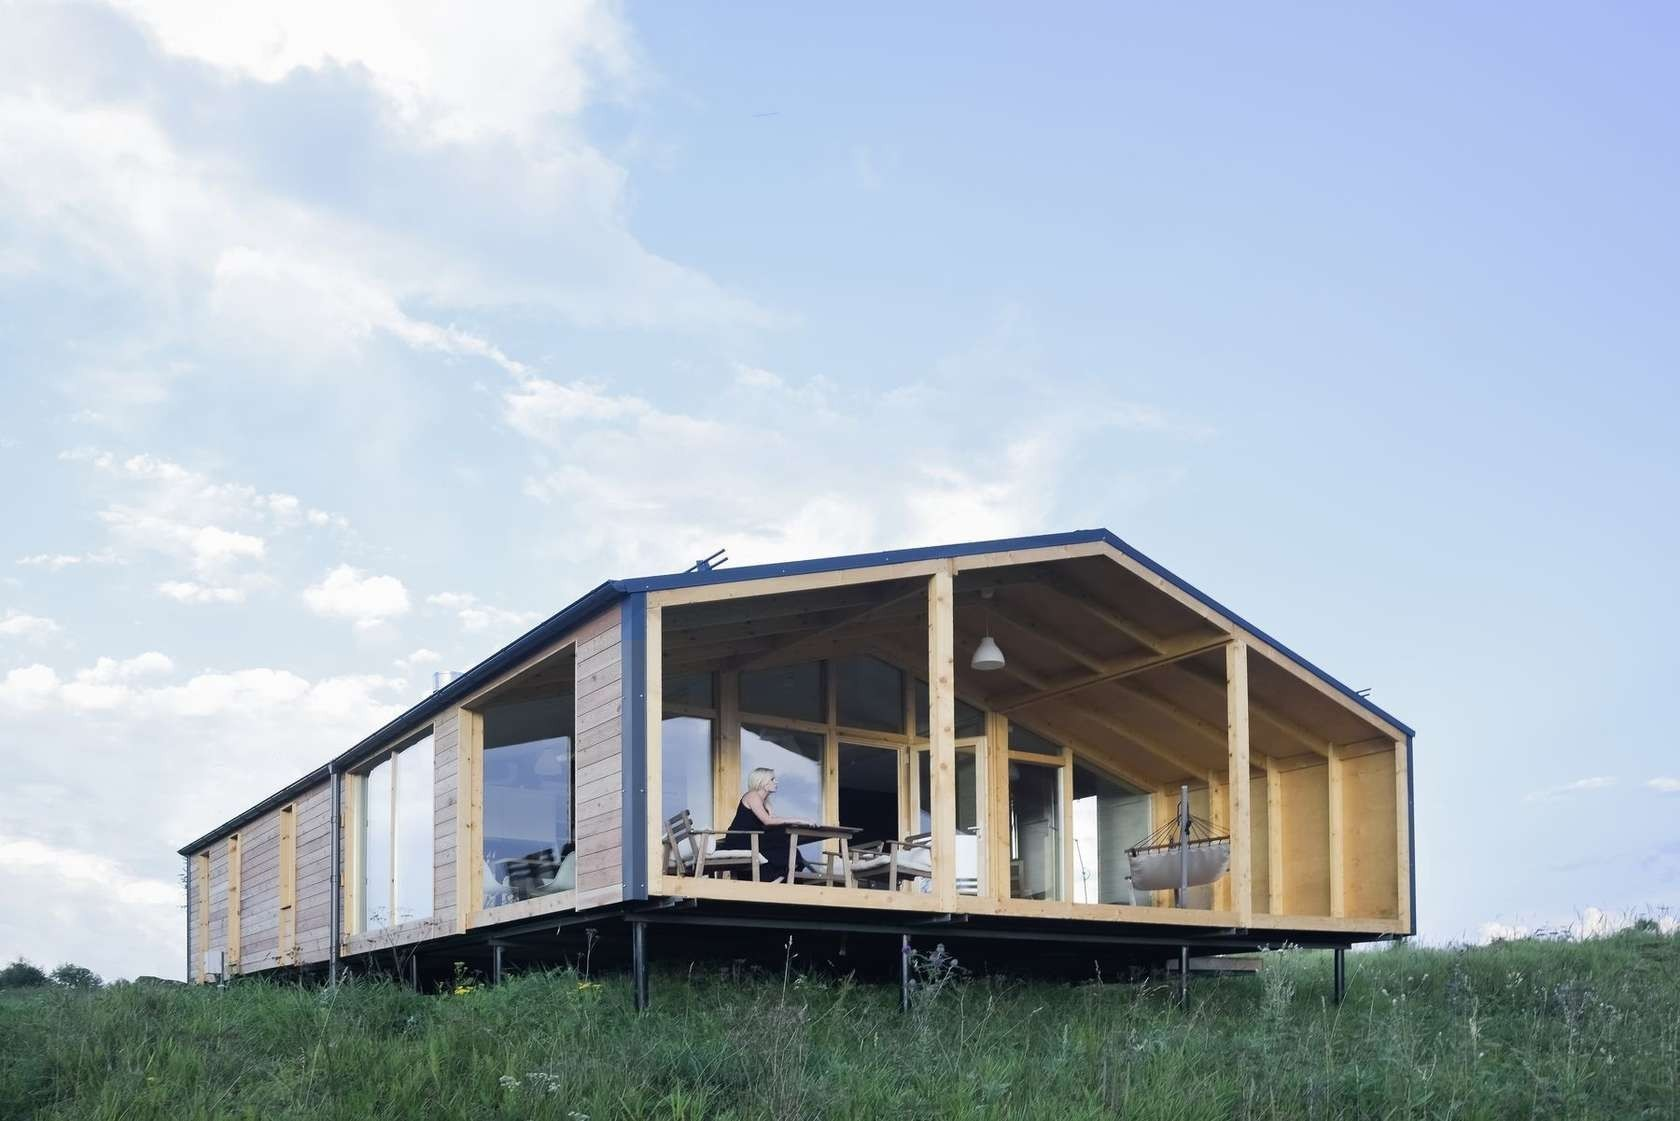 Affordable prefab cabin Dubldom now accepting U.S. pre-orders